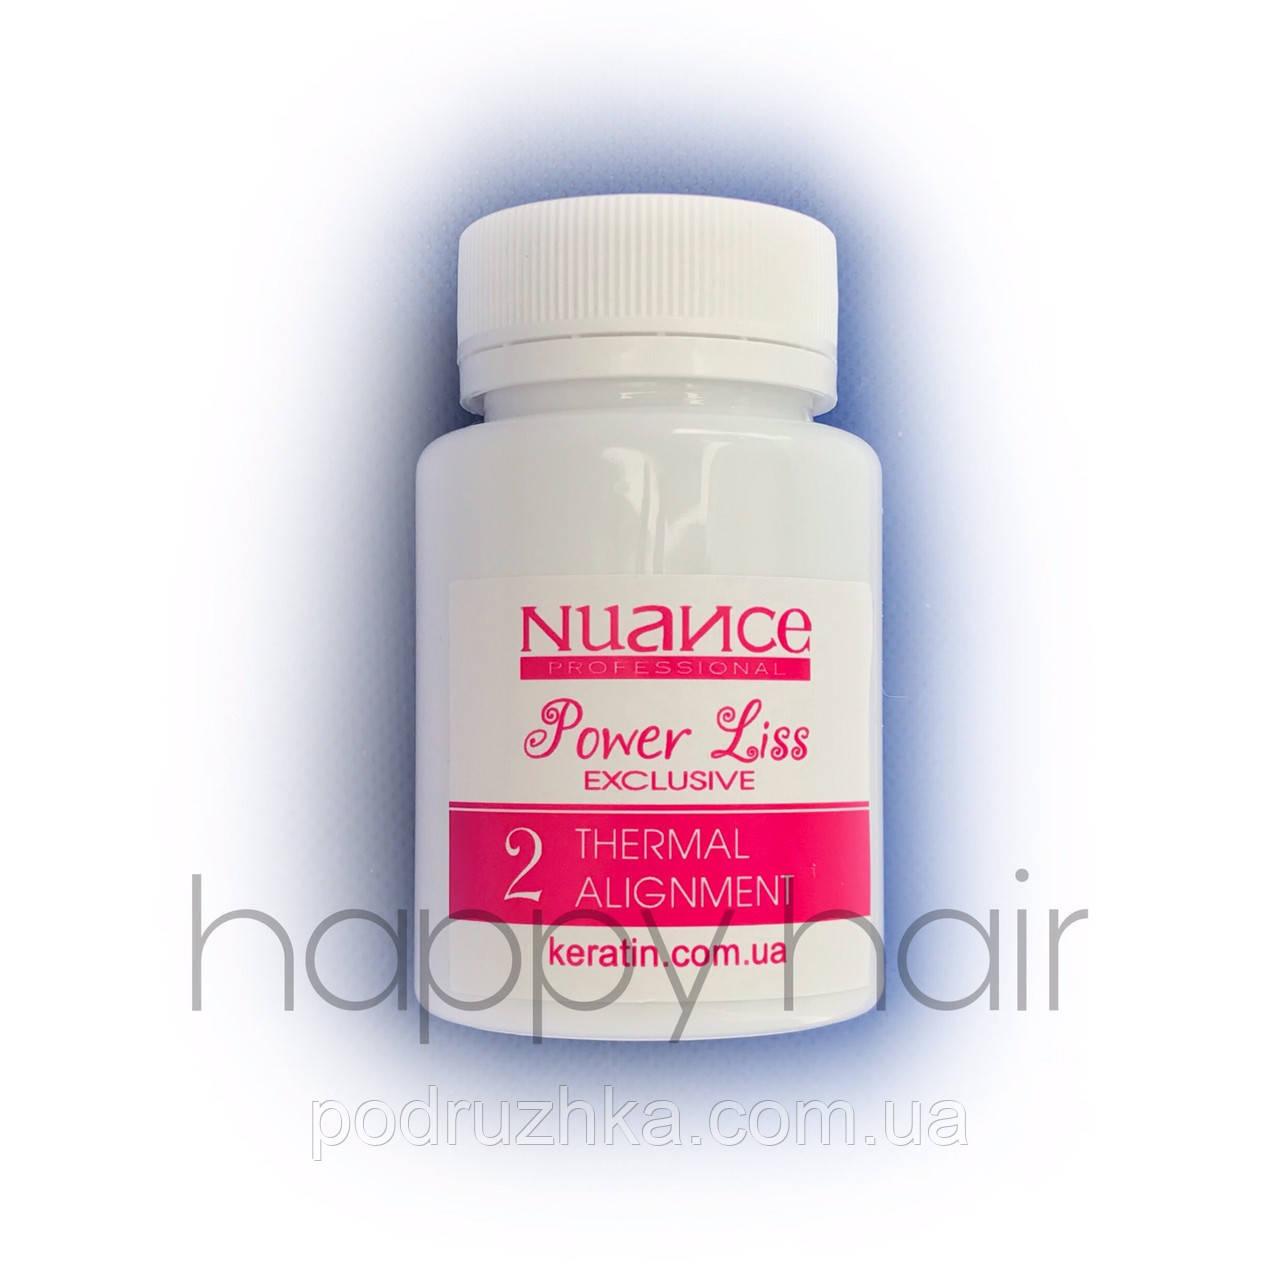 Nuance Power Liss Состав кератина для волос (шаг 2) 200 г